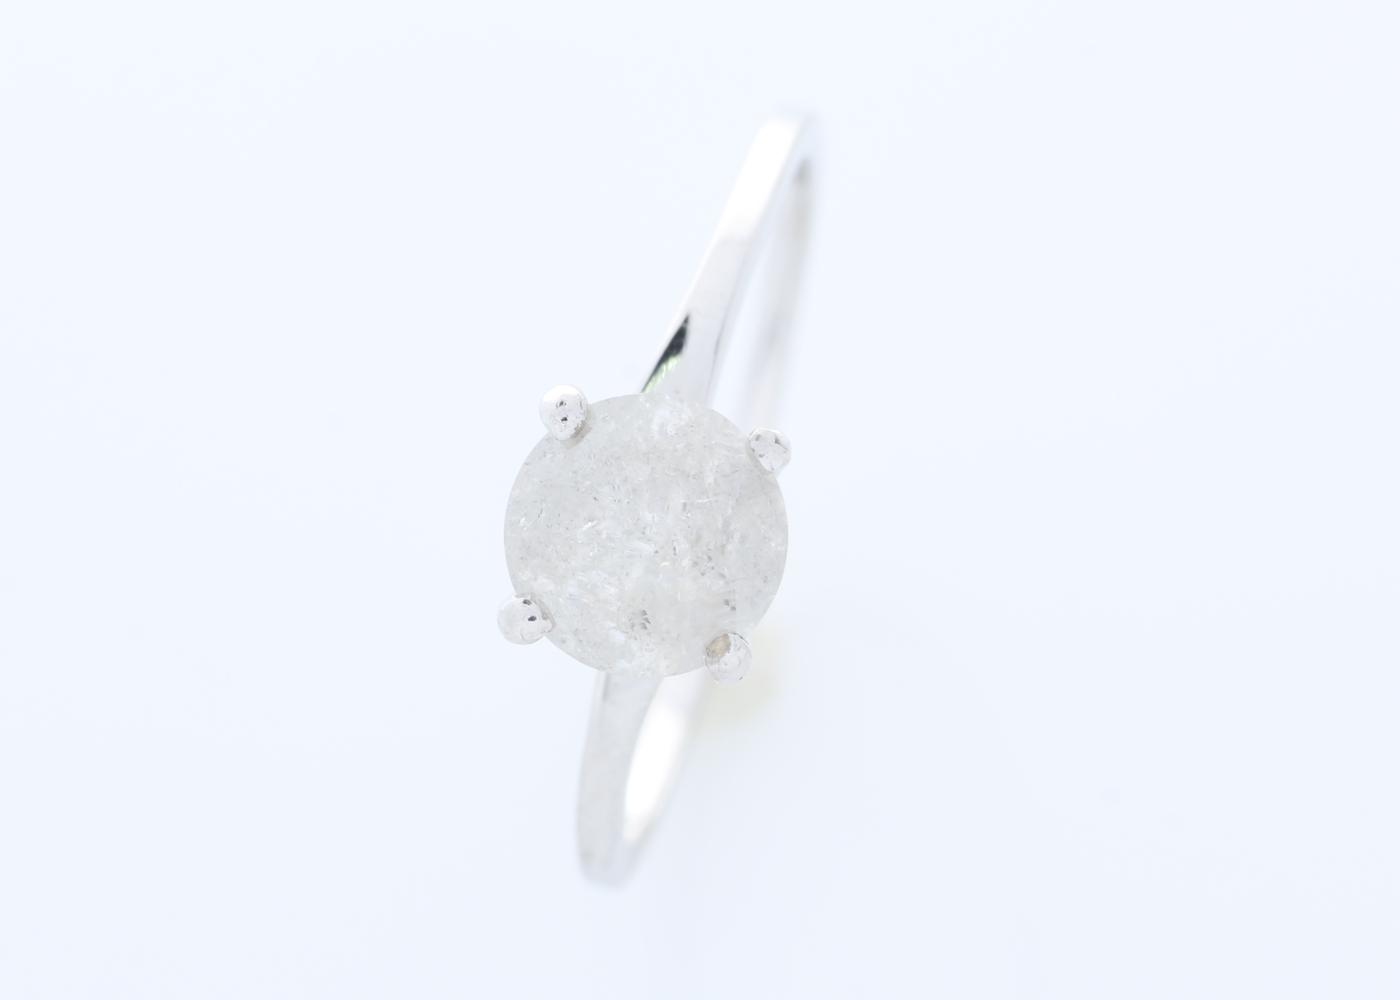 Lot 9 - 18ct White Gold Wire Set Diamond Ring 1.05 Carats